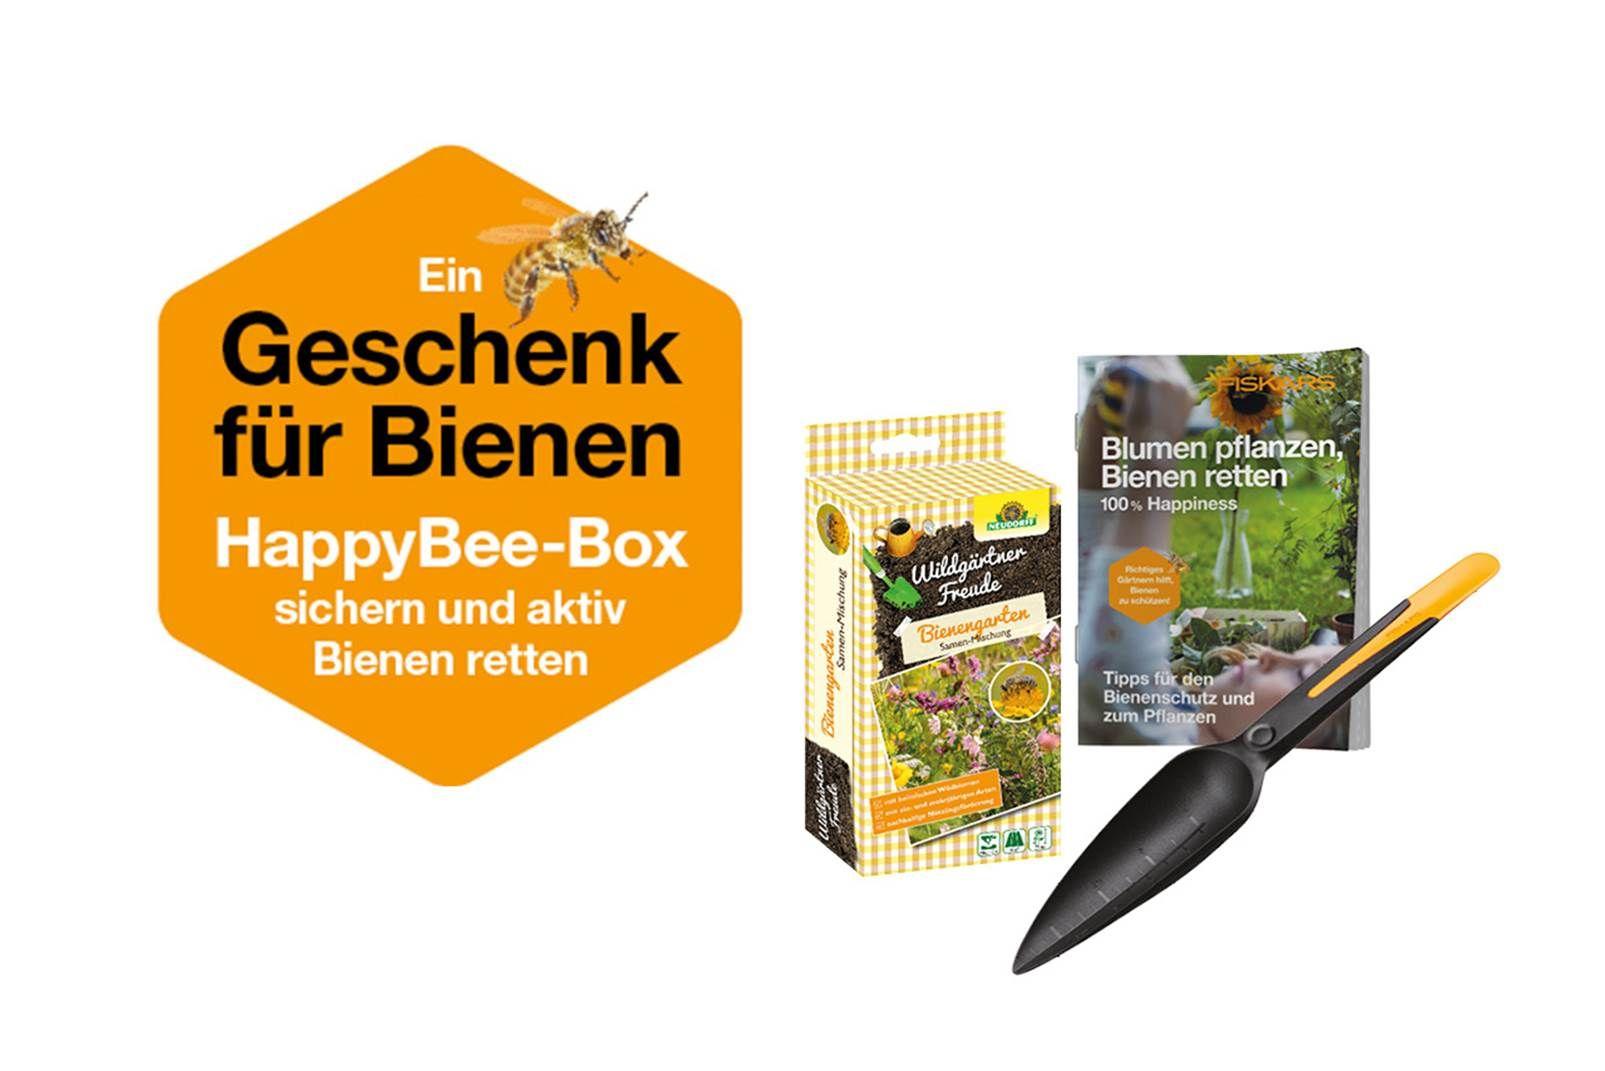 Gratis Bienenbox ab 75€ Fiskars-Produkte (Obi)